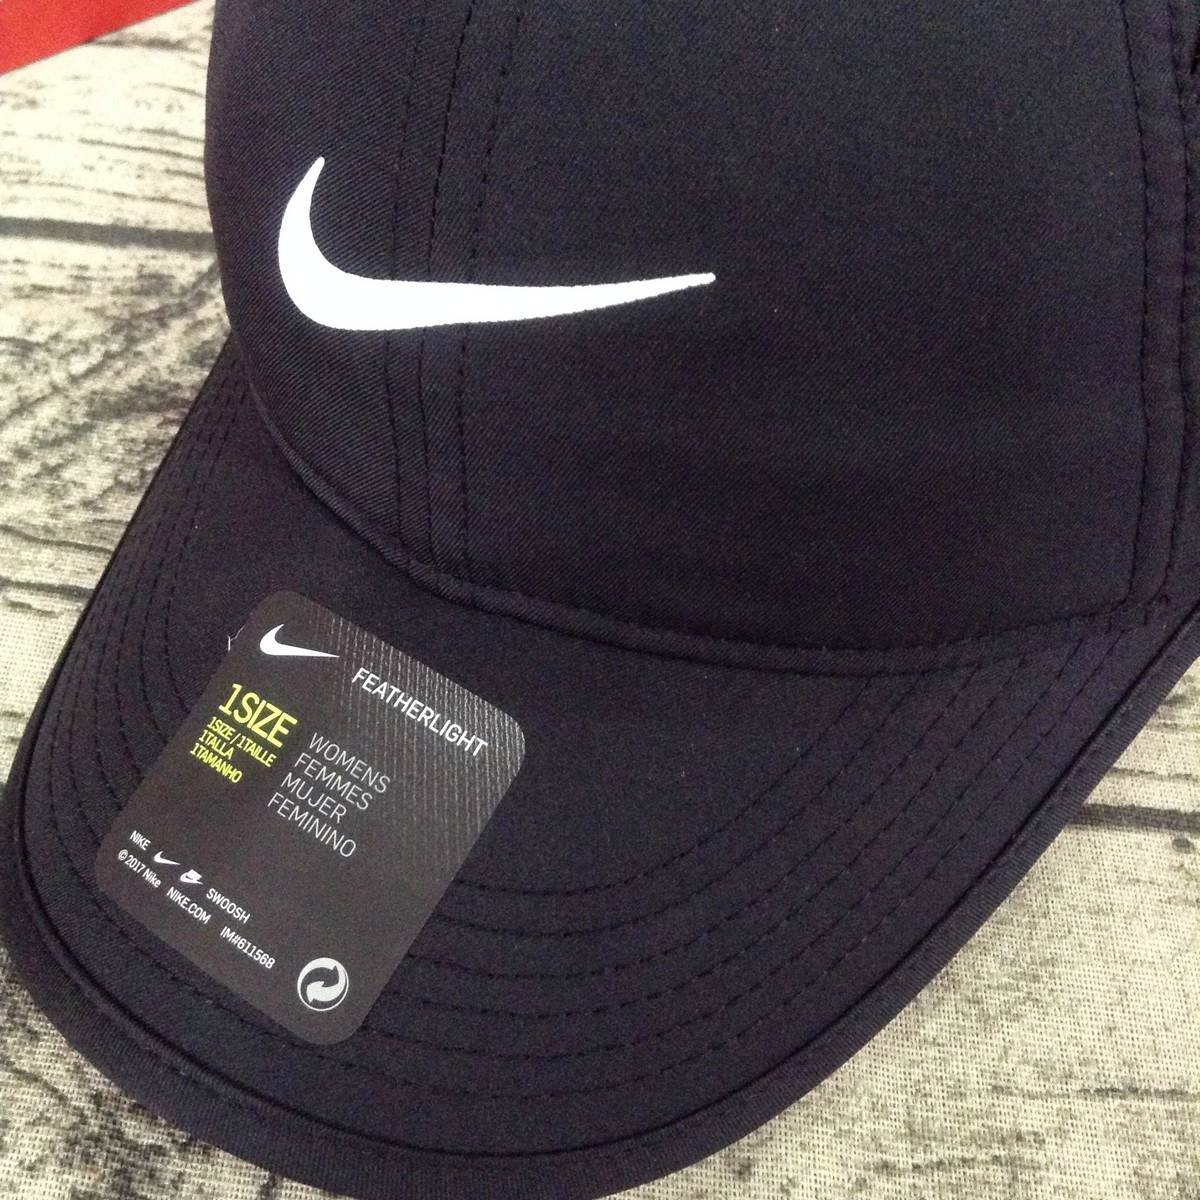 Mũ Nike Women's Feather Light Black 679424-010